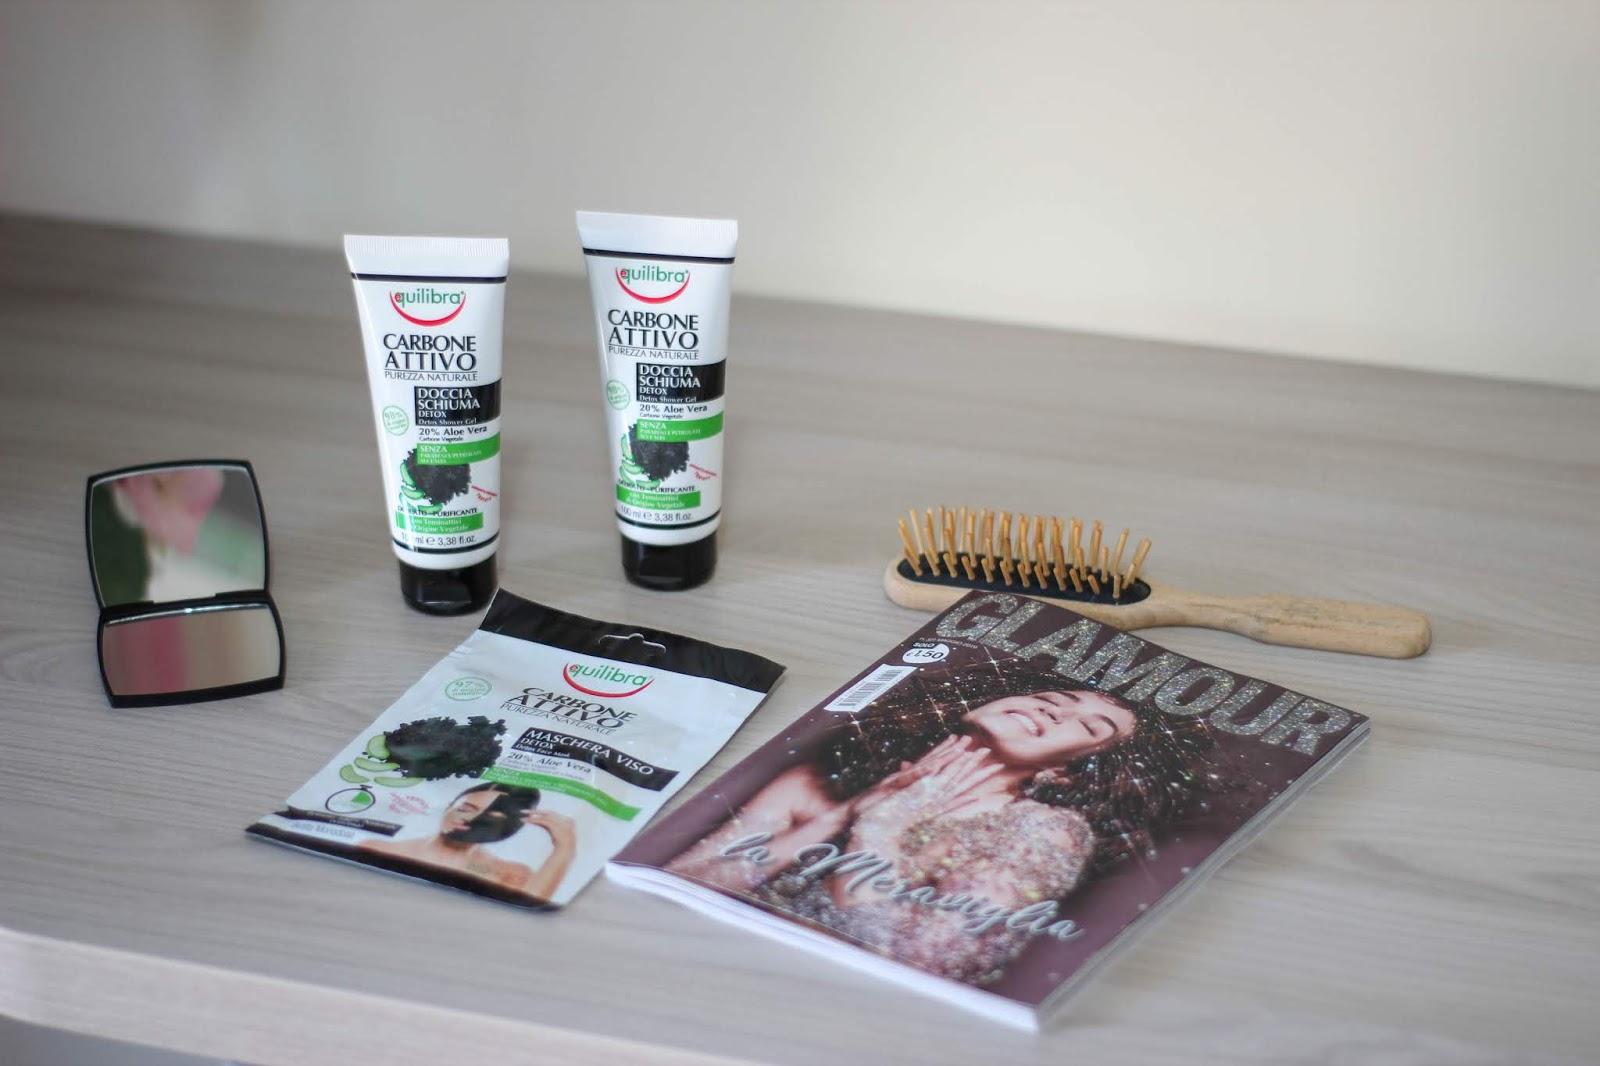 recensione Equilibra - Docciaschiuma Detox Carbone Attivo - Maschera Viso Detox